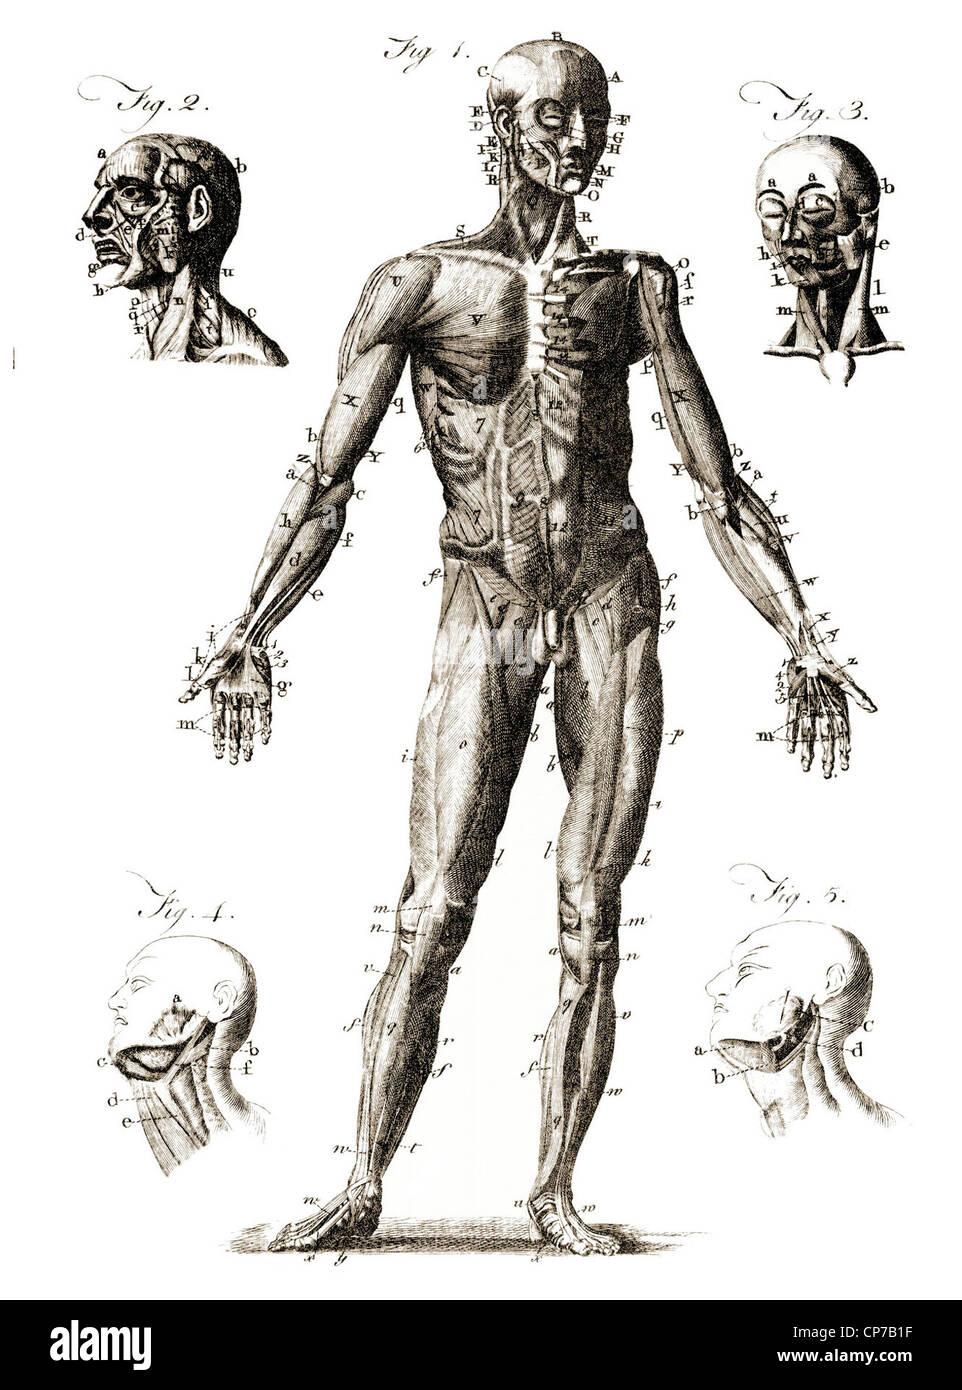 Human Body Anatomy Diagram Engraving Stock Photos Human Body